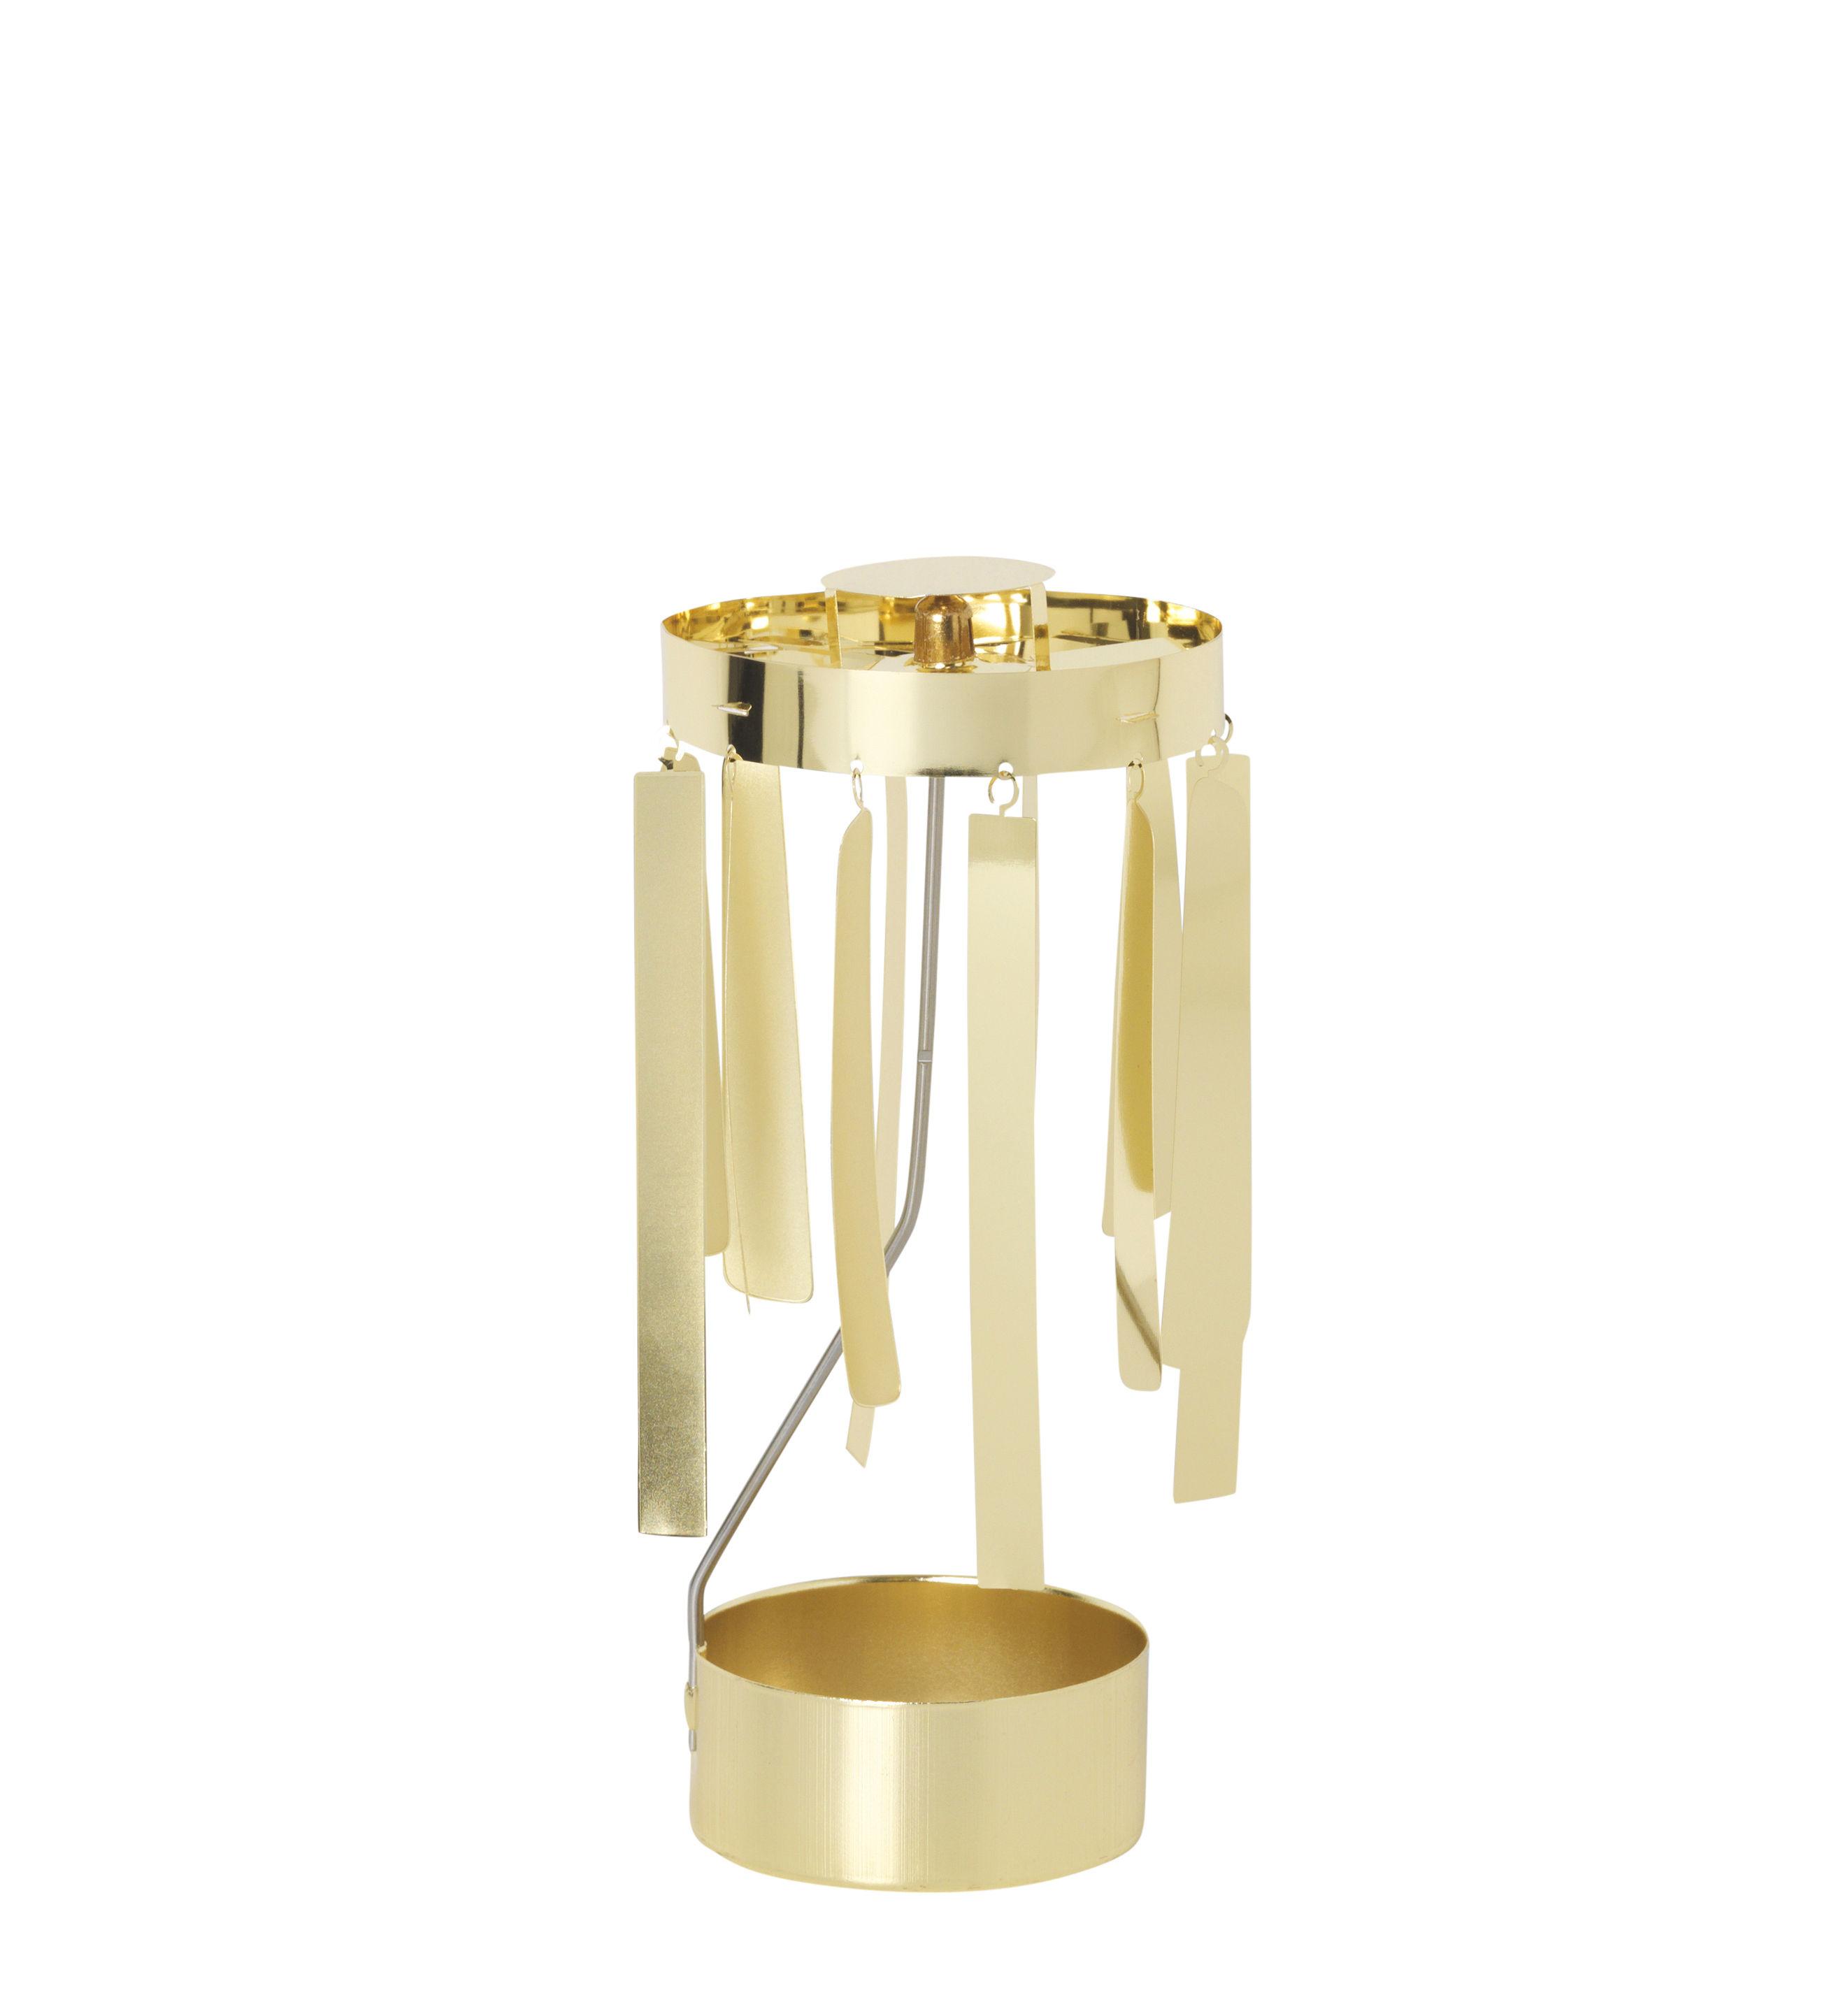 Dekoration - Dekorationsartikel - Tangle Carillon de Noël - Ferm Living - Goldfarben - Metall